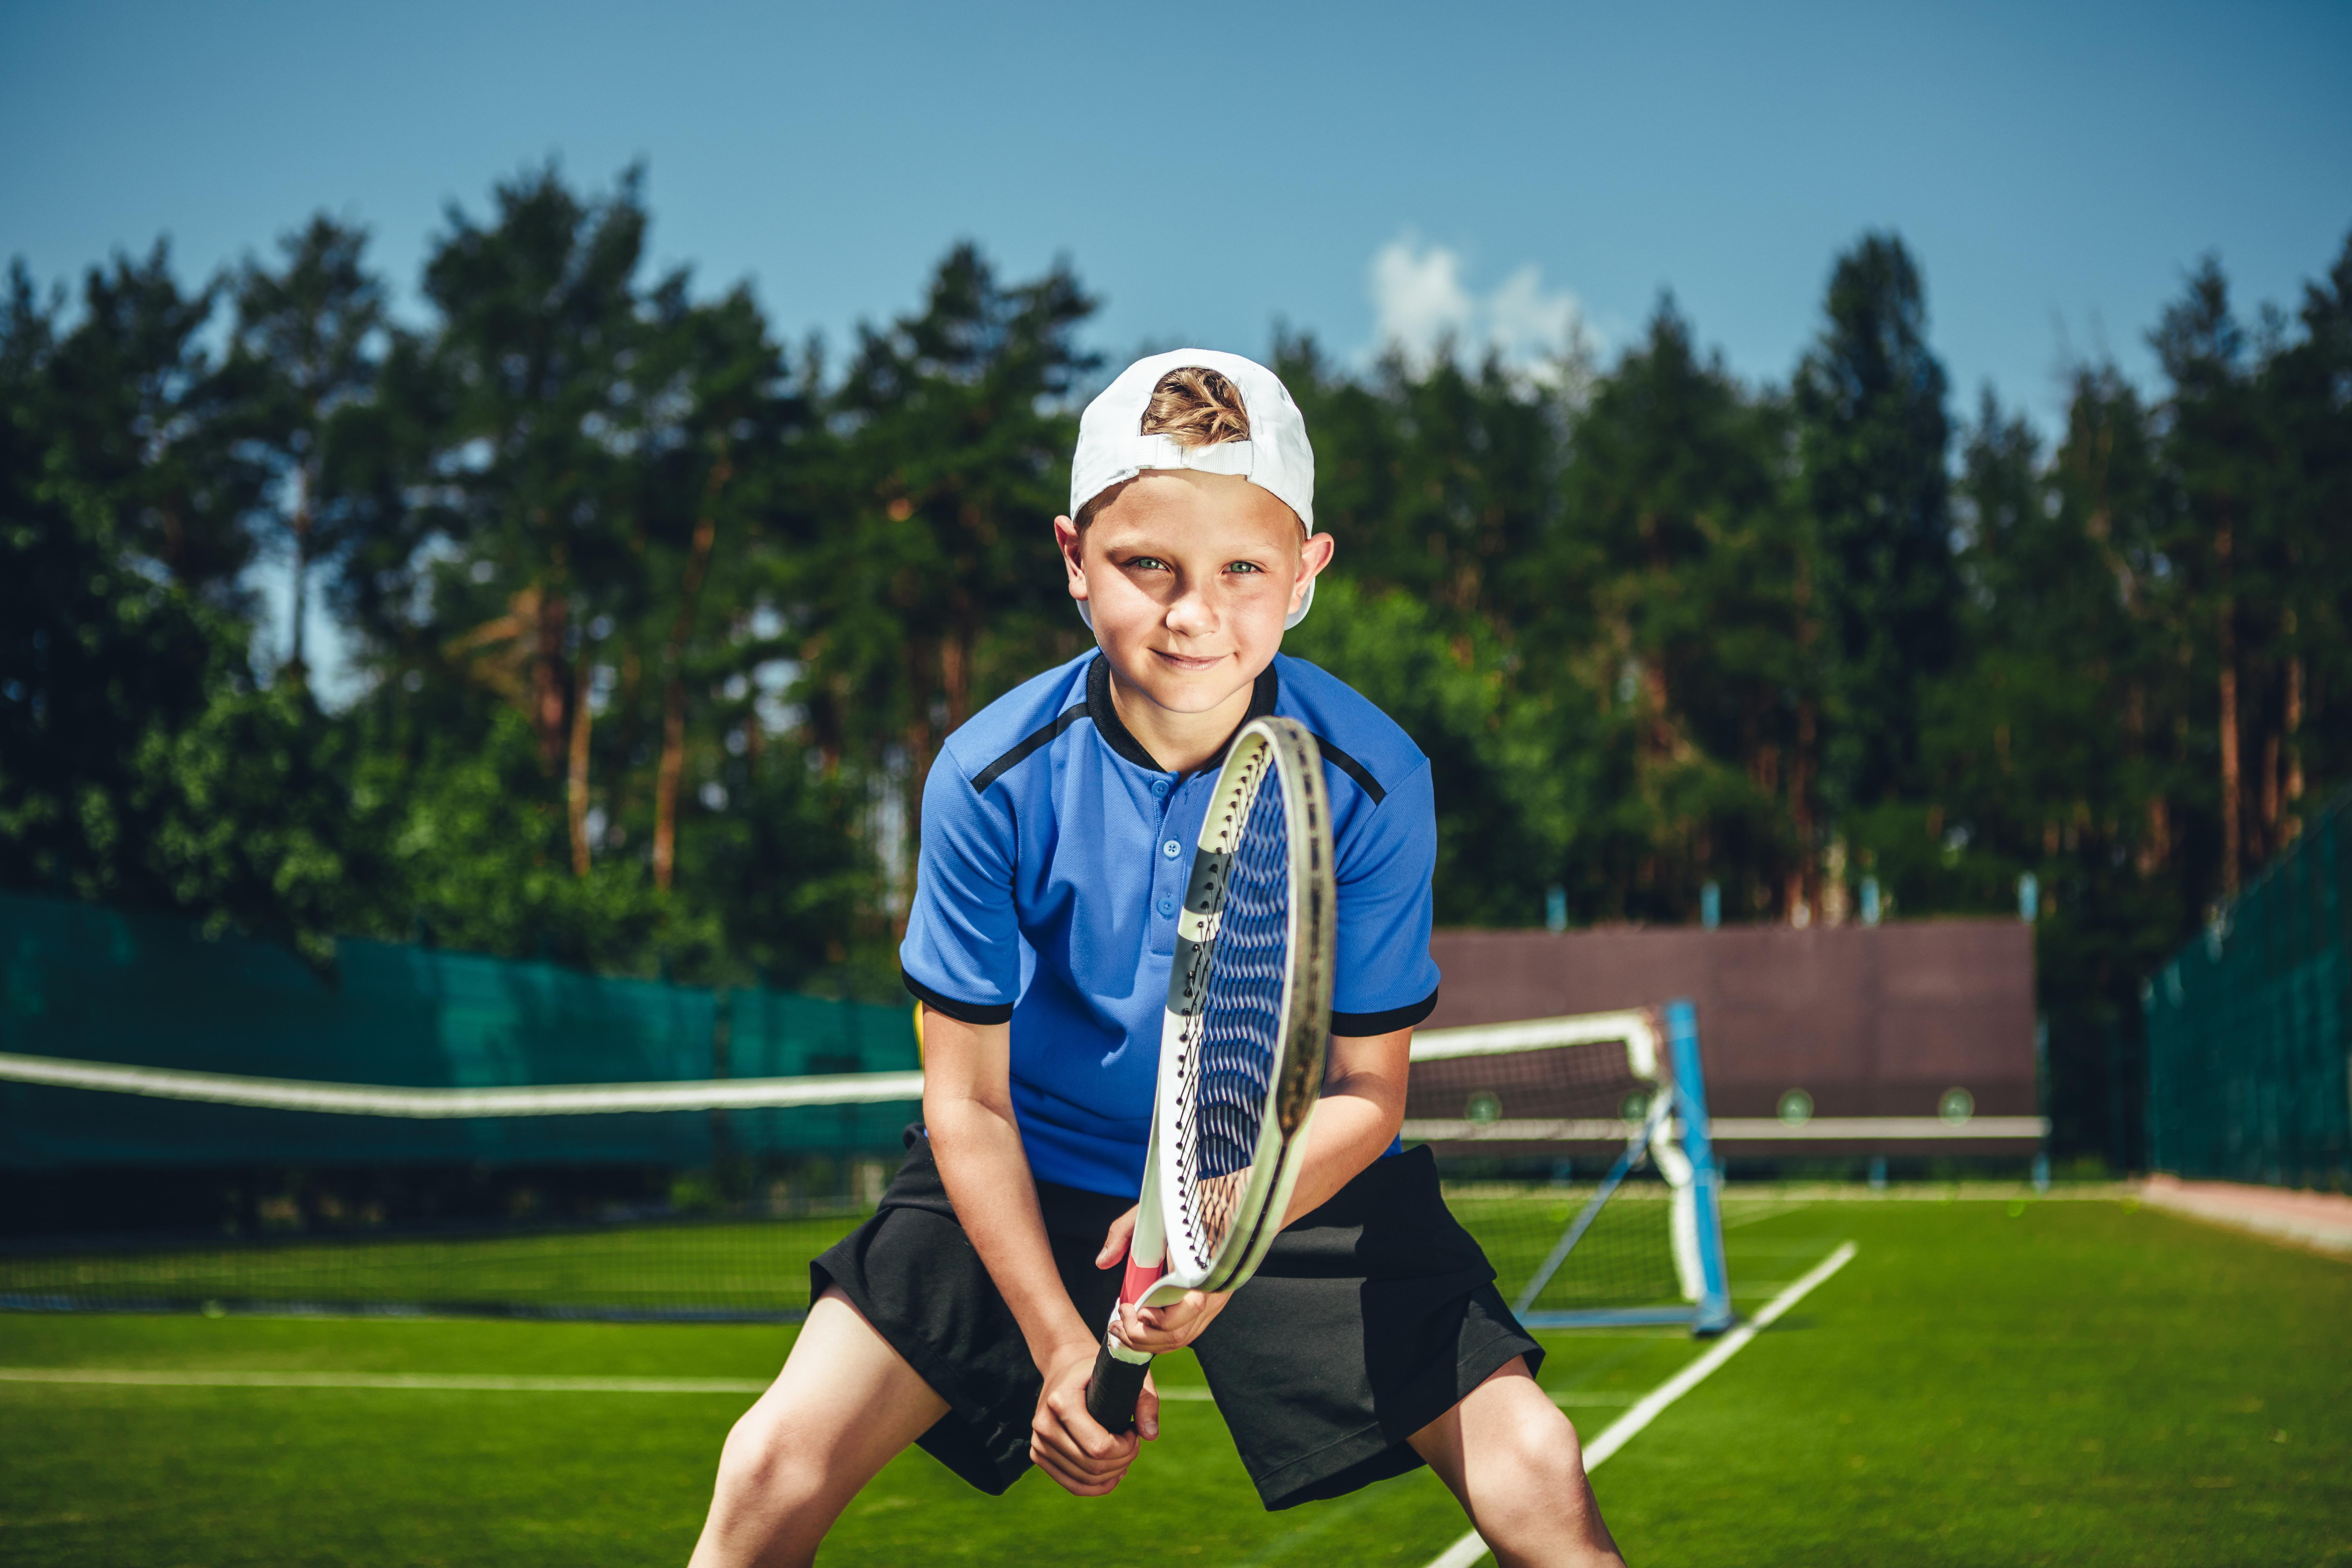 Proud/happy child holding tennis racket on green tennis field